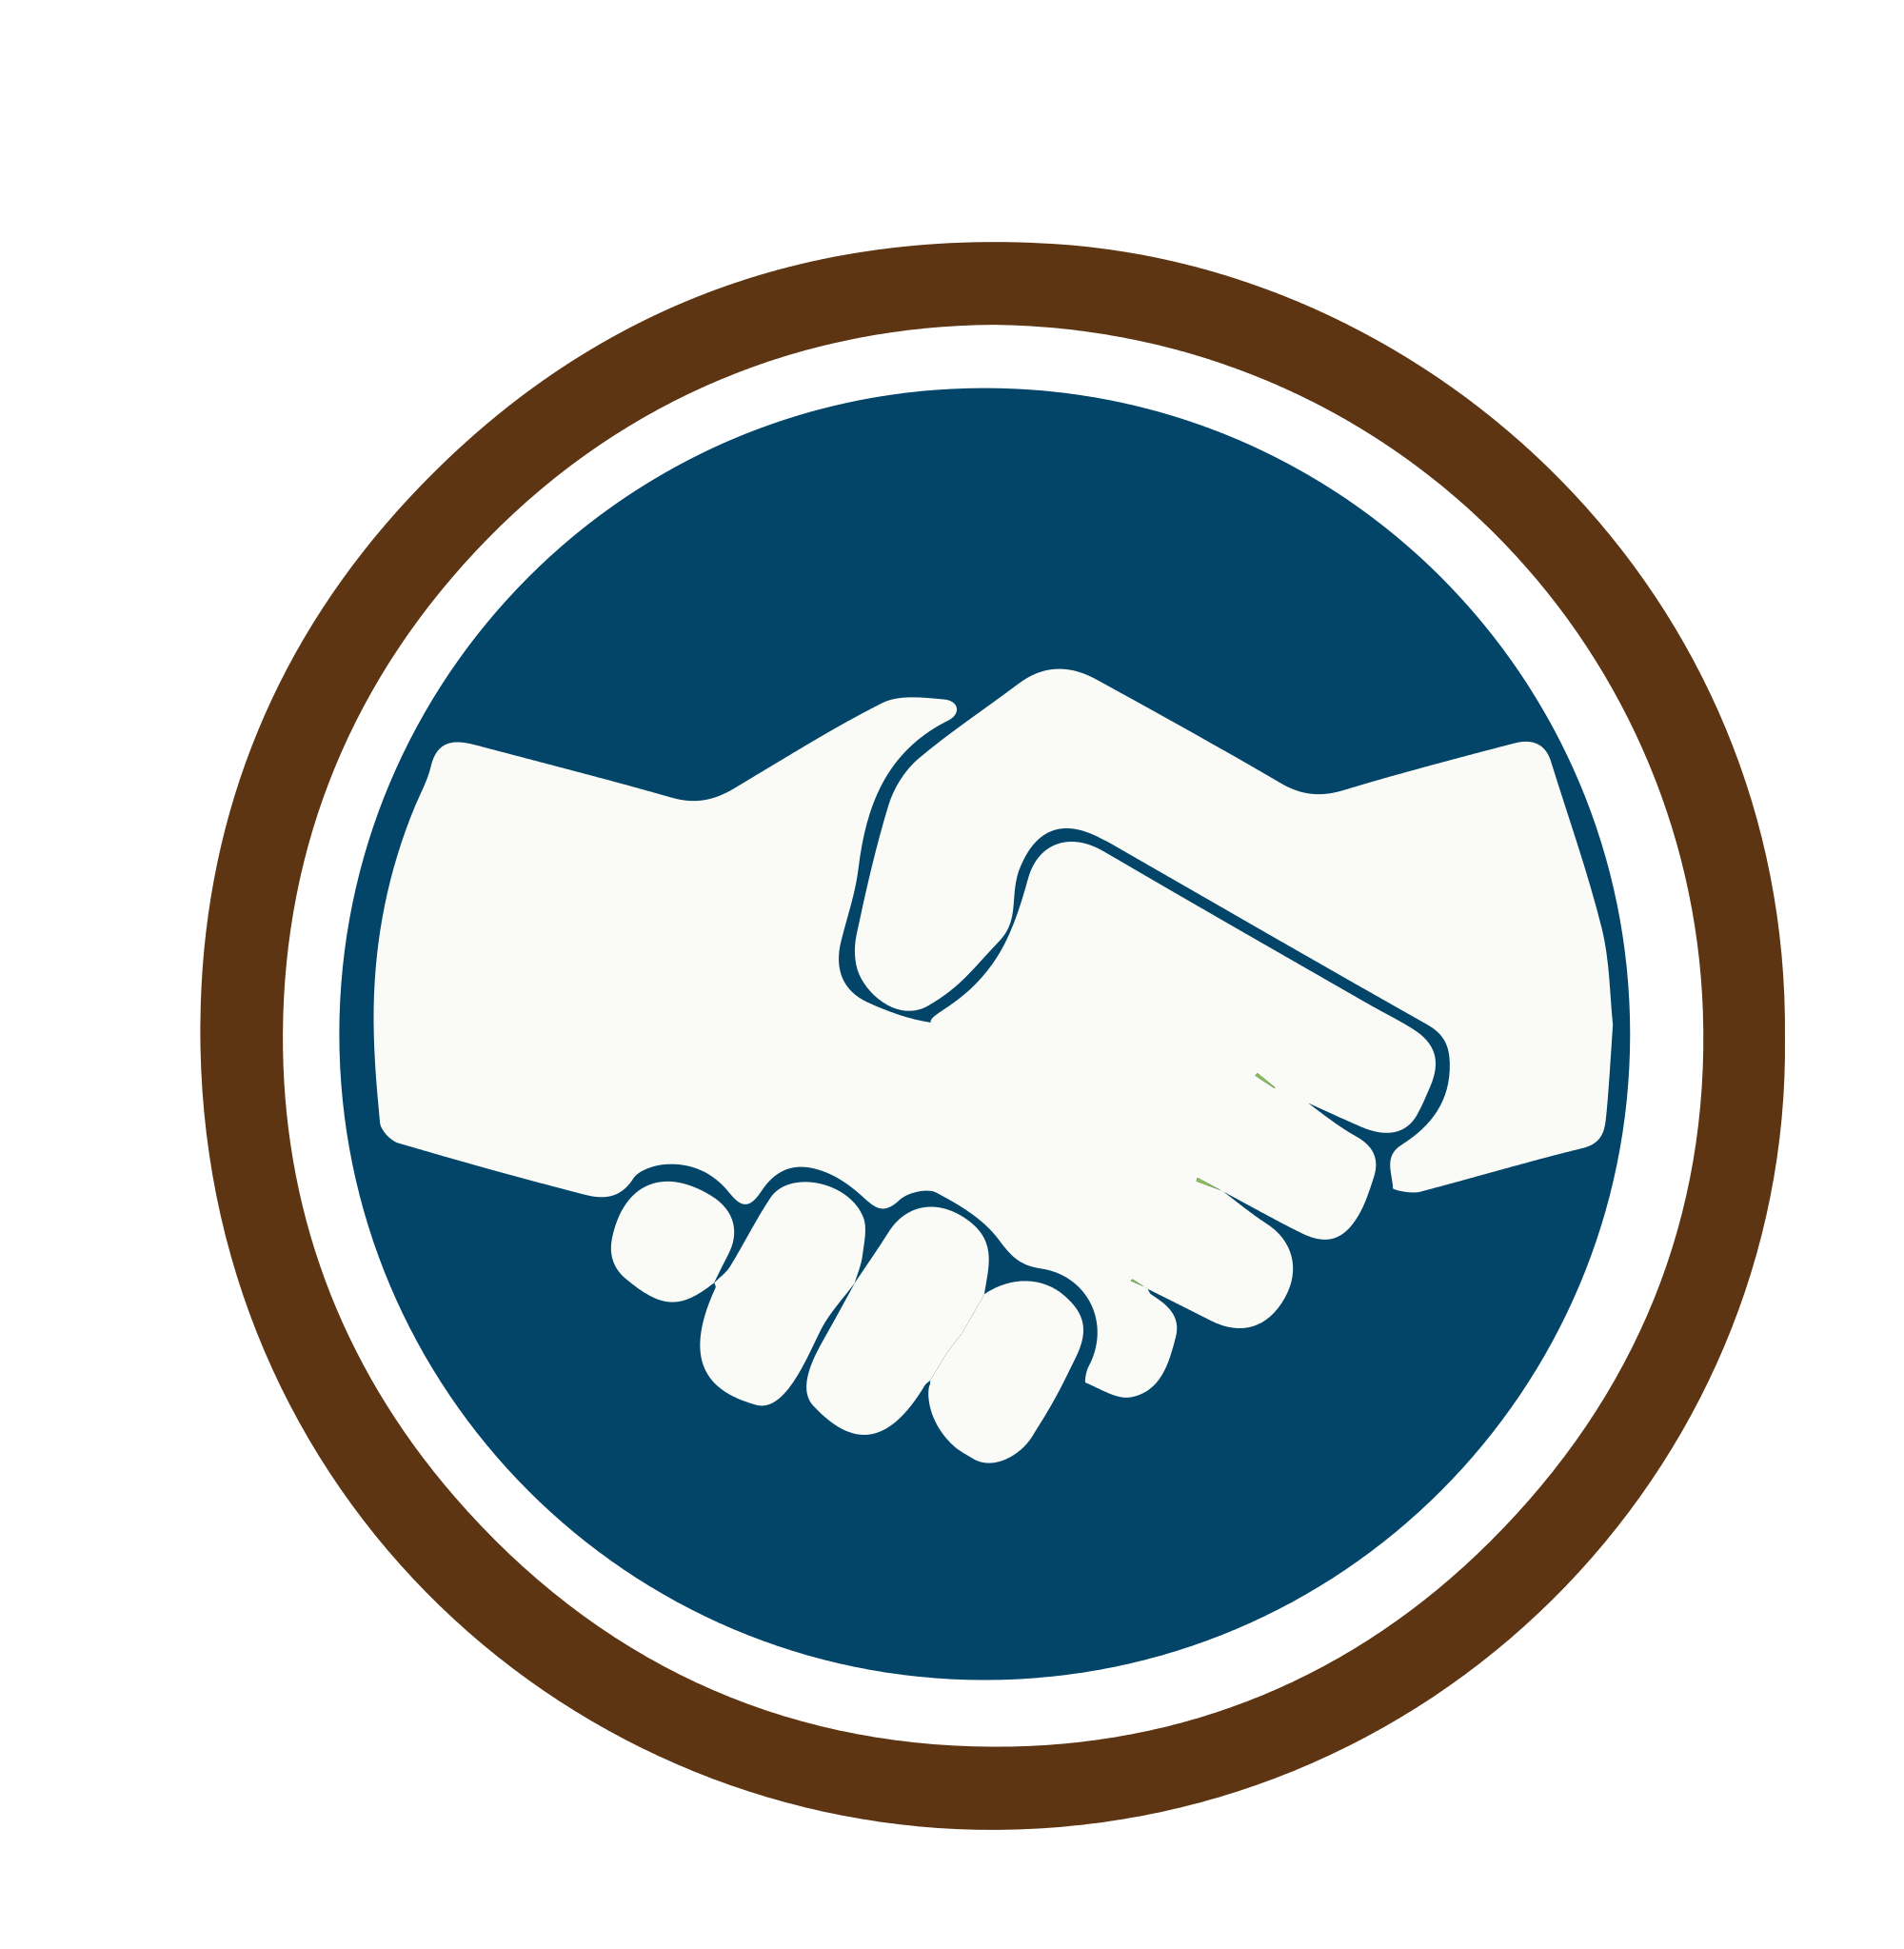 Handshake clipart two hand. File logo svg wikimedia